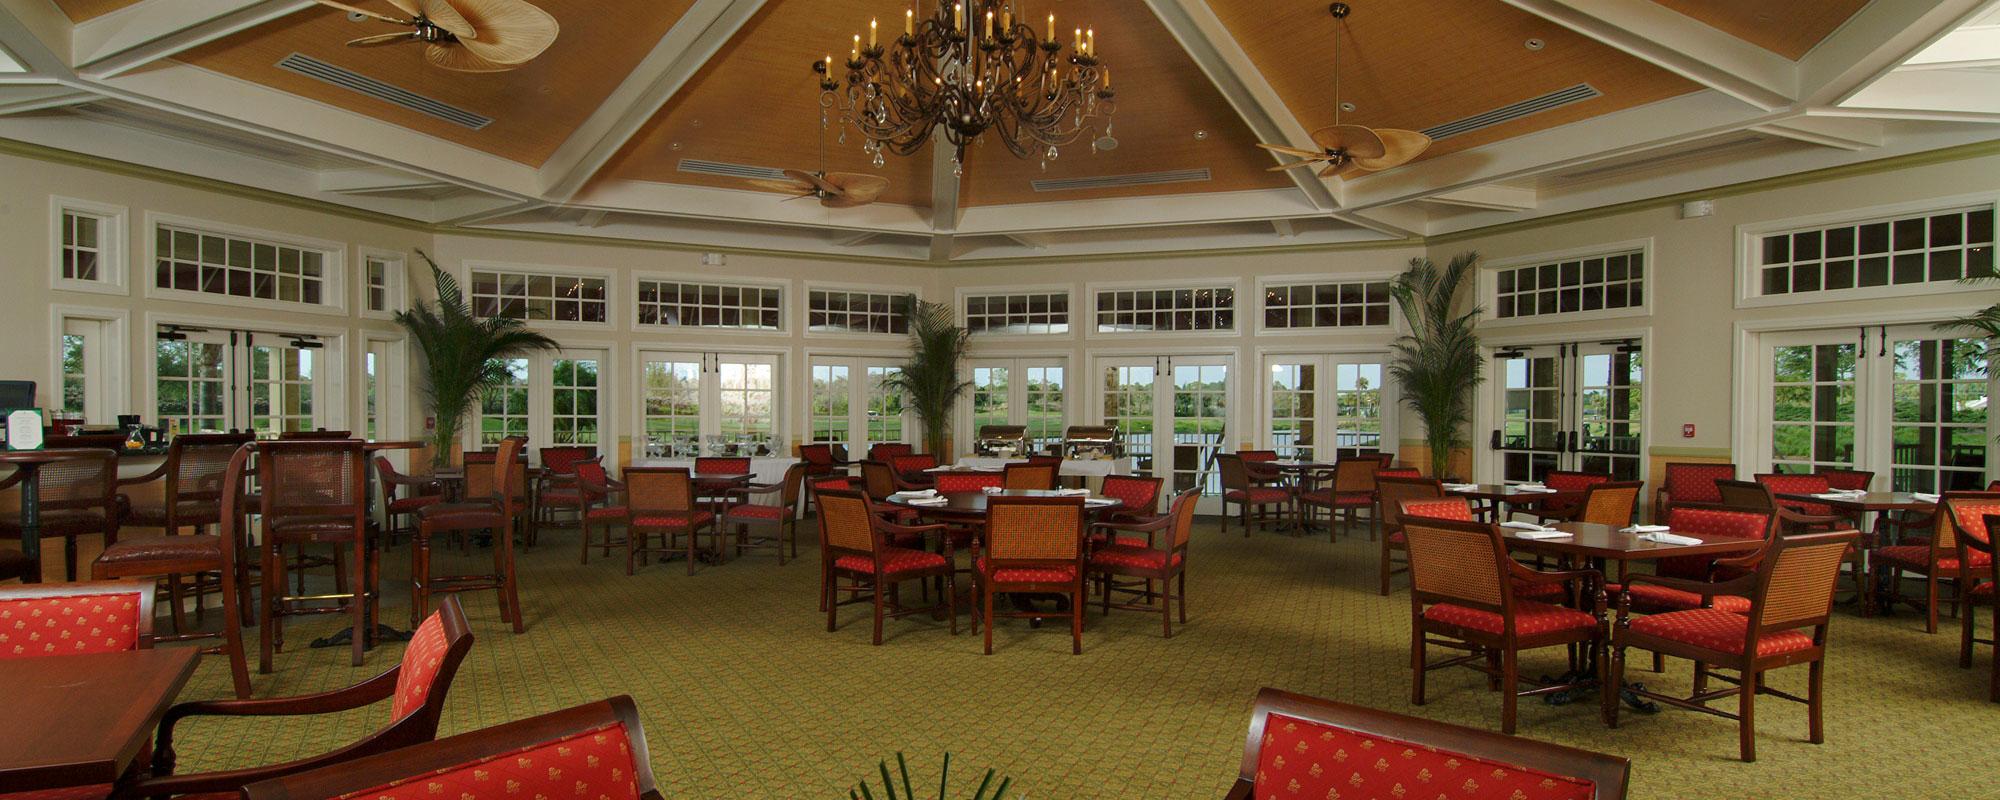 Laplaya Country Club Dining Room – Naples